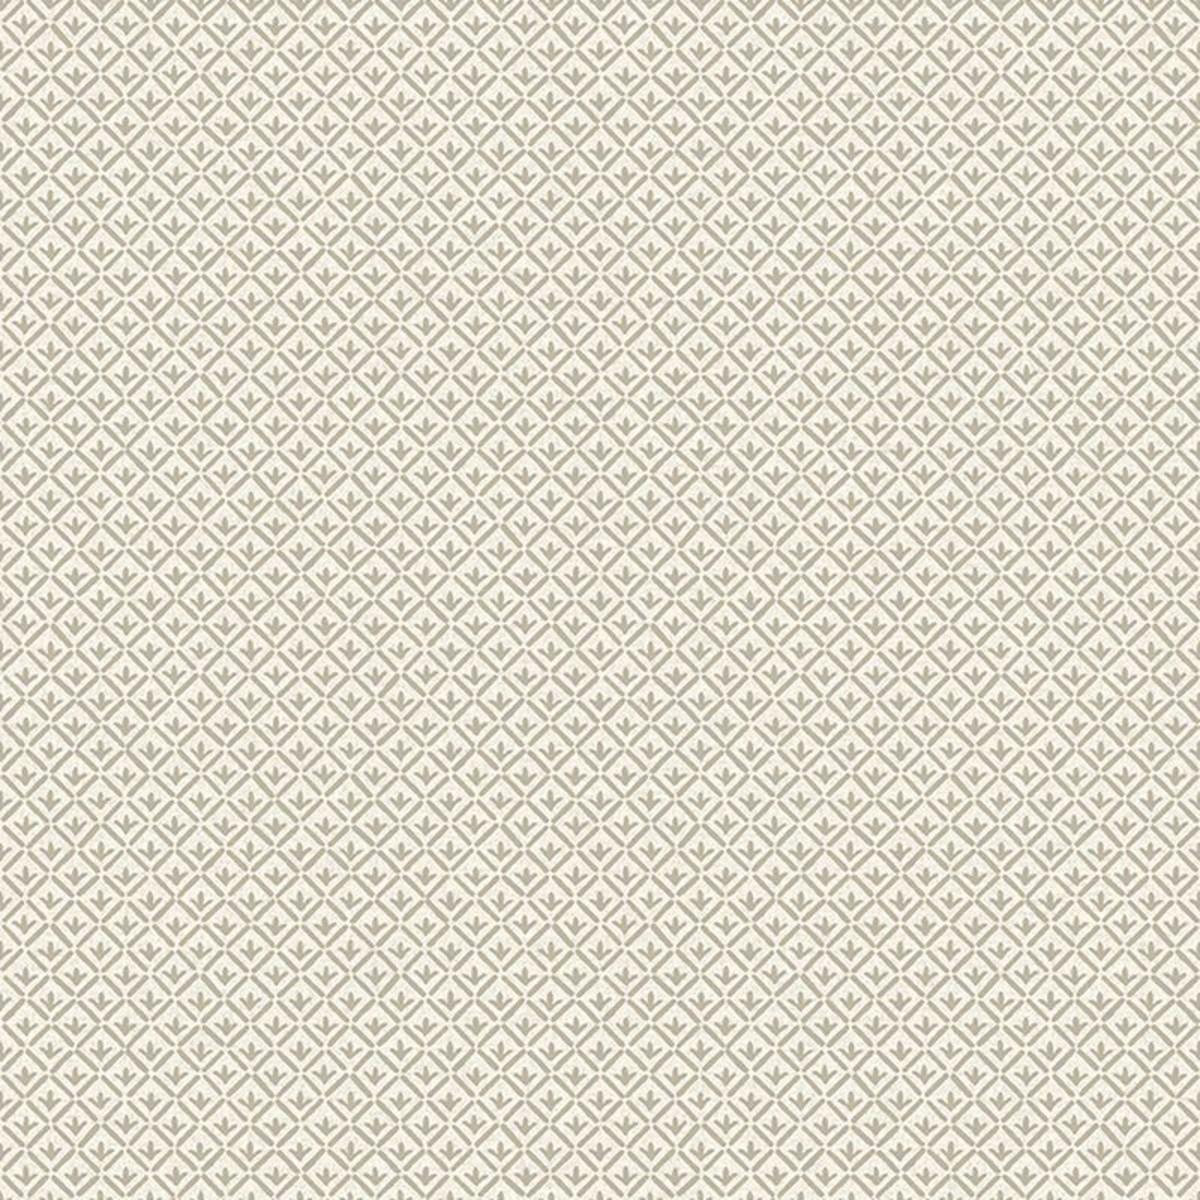 Обои флизелиновые The Paper Partnership Patterdale бежевые 0.53 м WP0111203